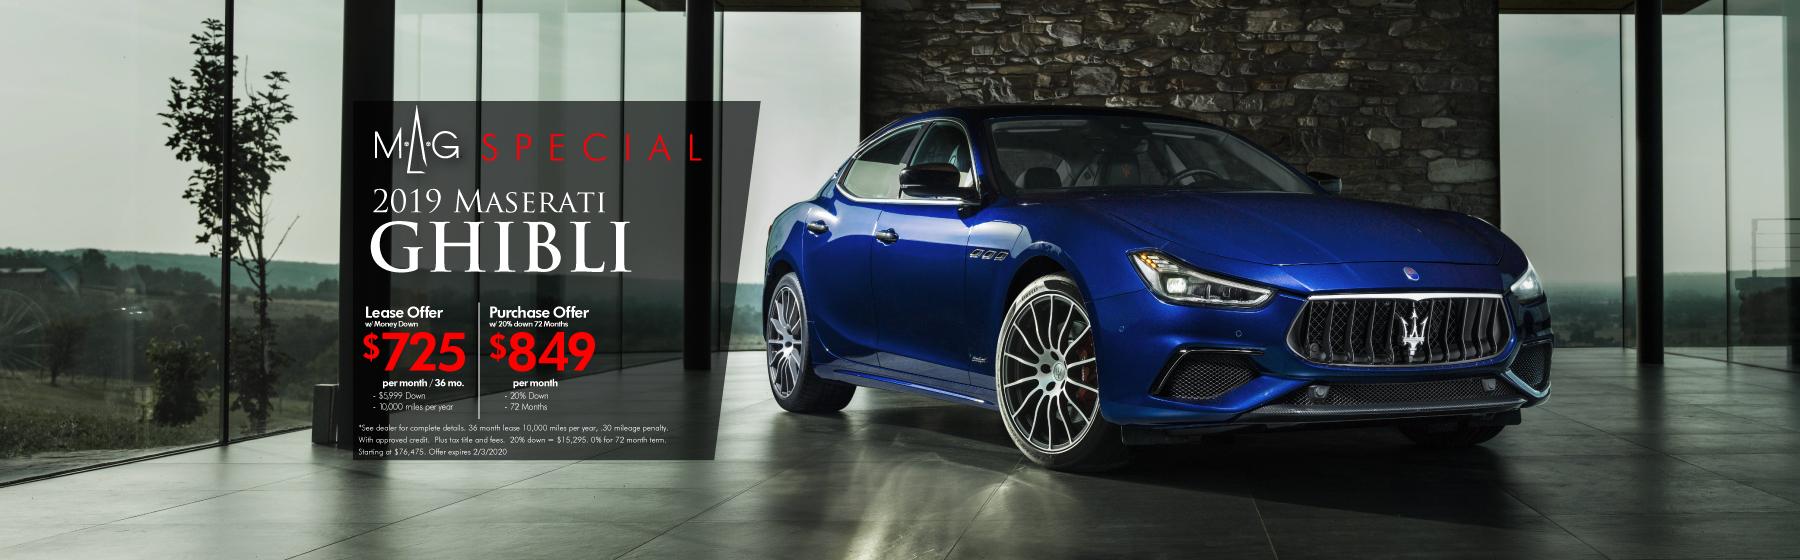 New Ferrari, Lamborghini, Maserati, Rolls,Royce, Porsche